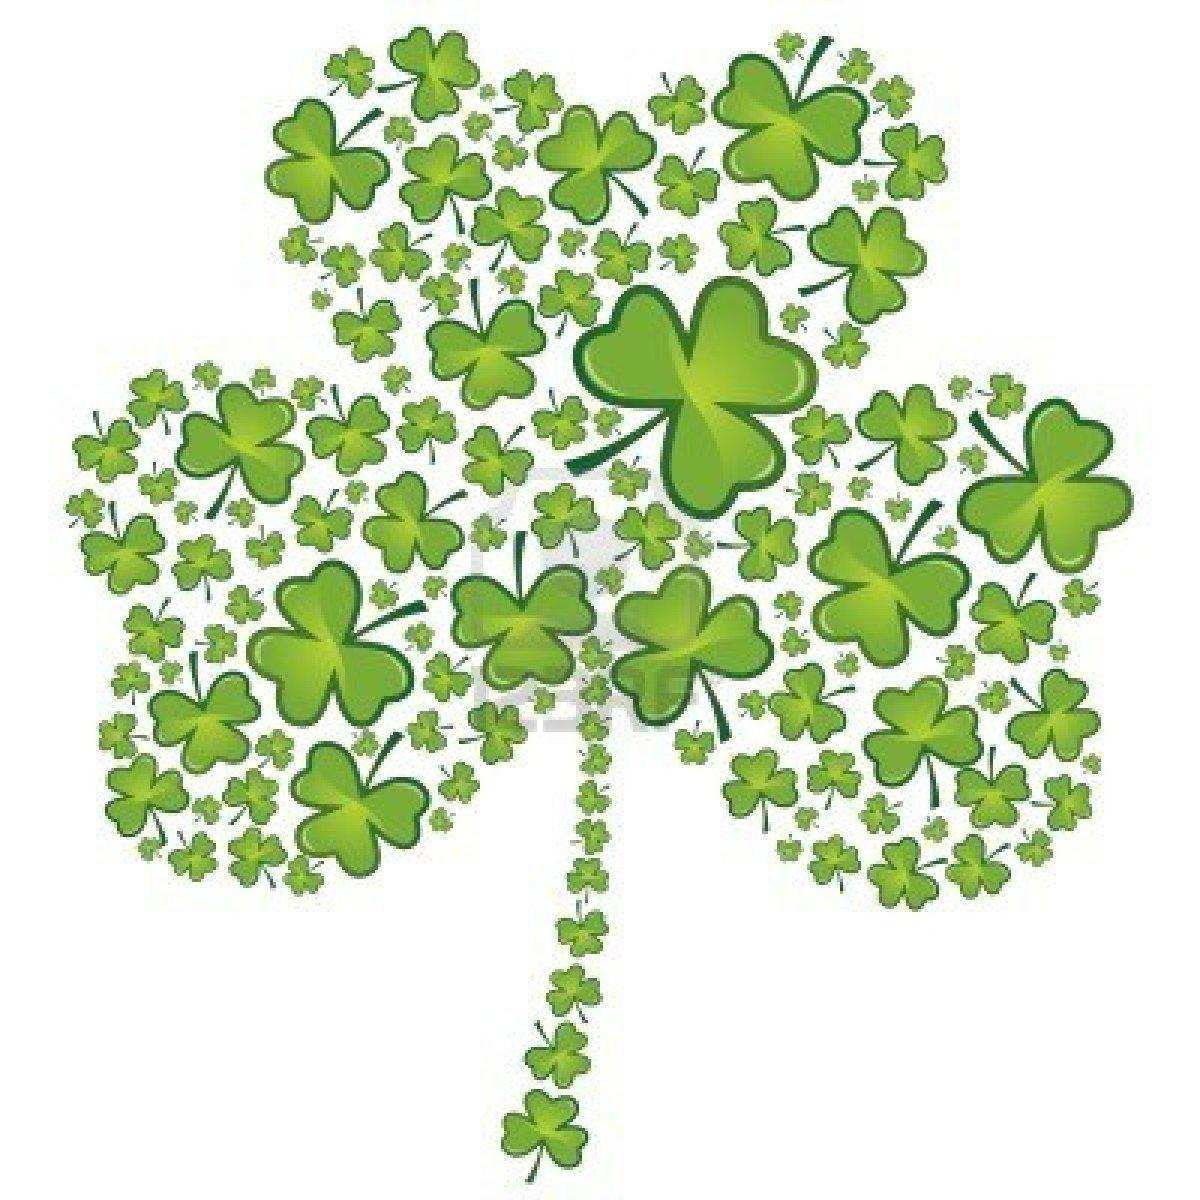 1200x1200 St. Patrick's Day 2014